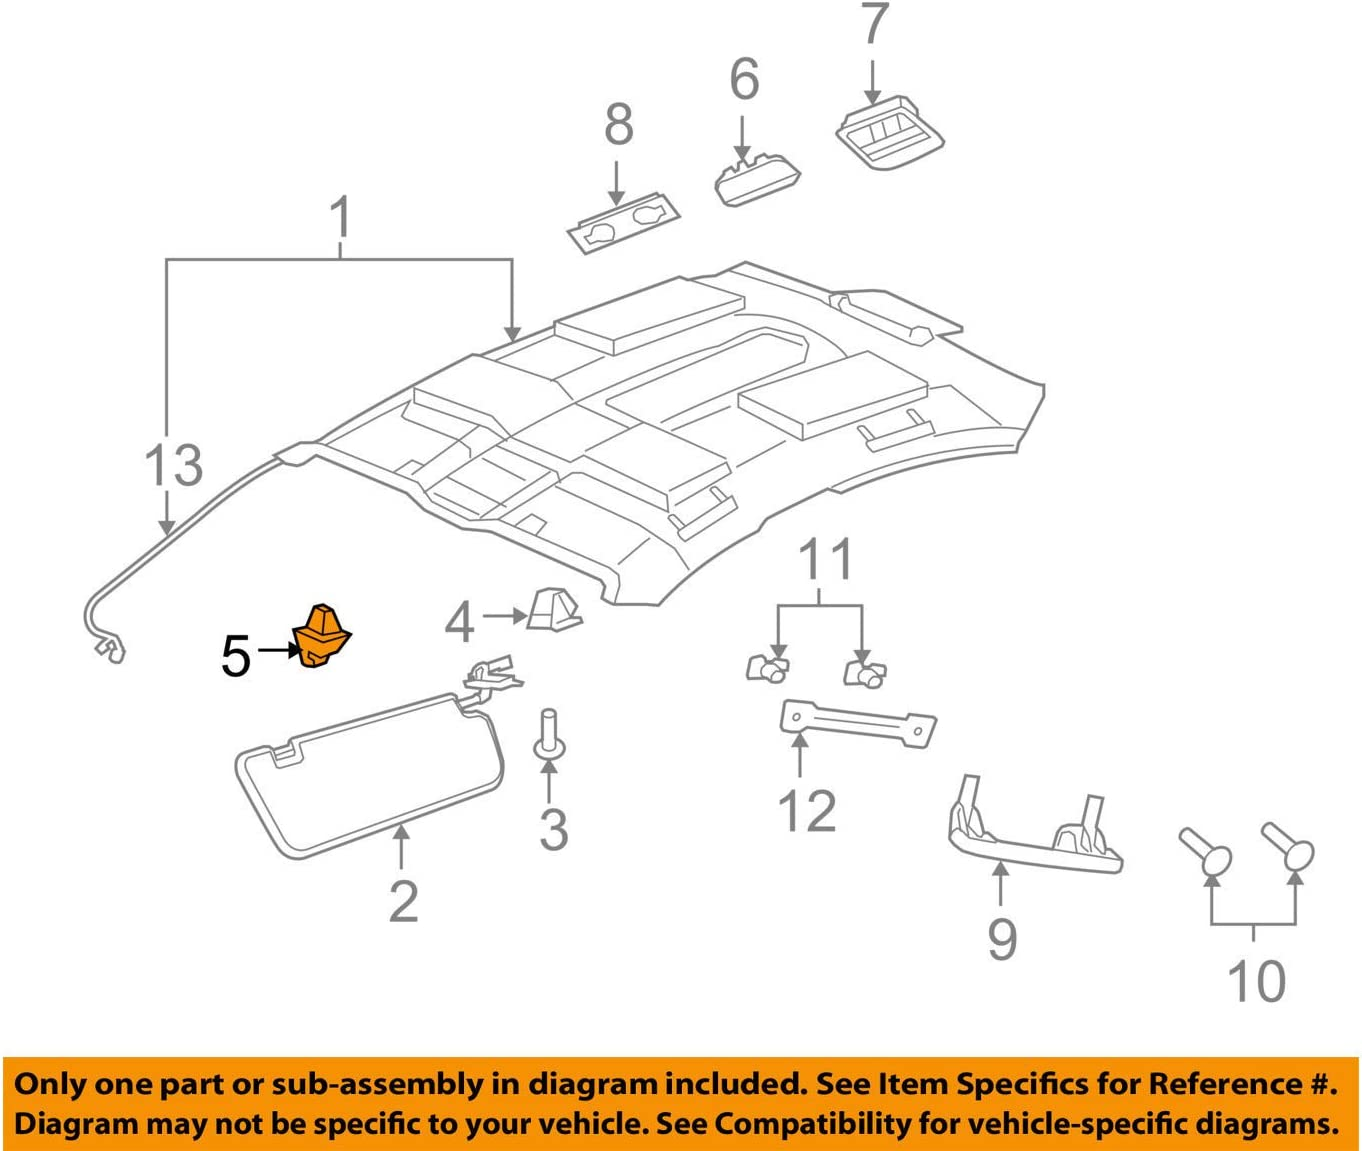 OEM NEW Interior Right or Left Sun Visor Support Clip 08-09 Pontiac G8 13187128